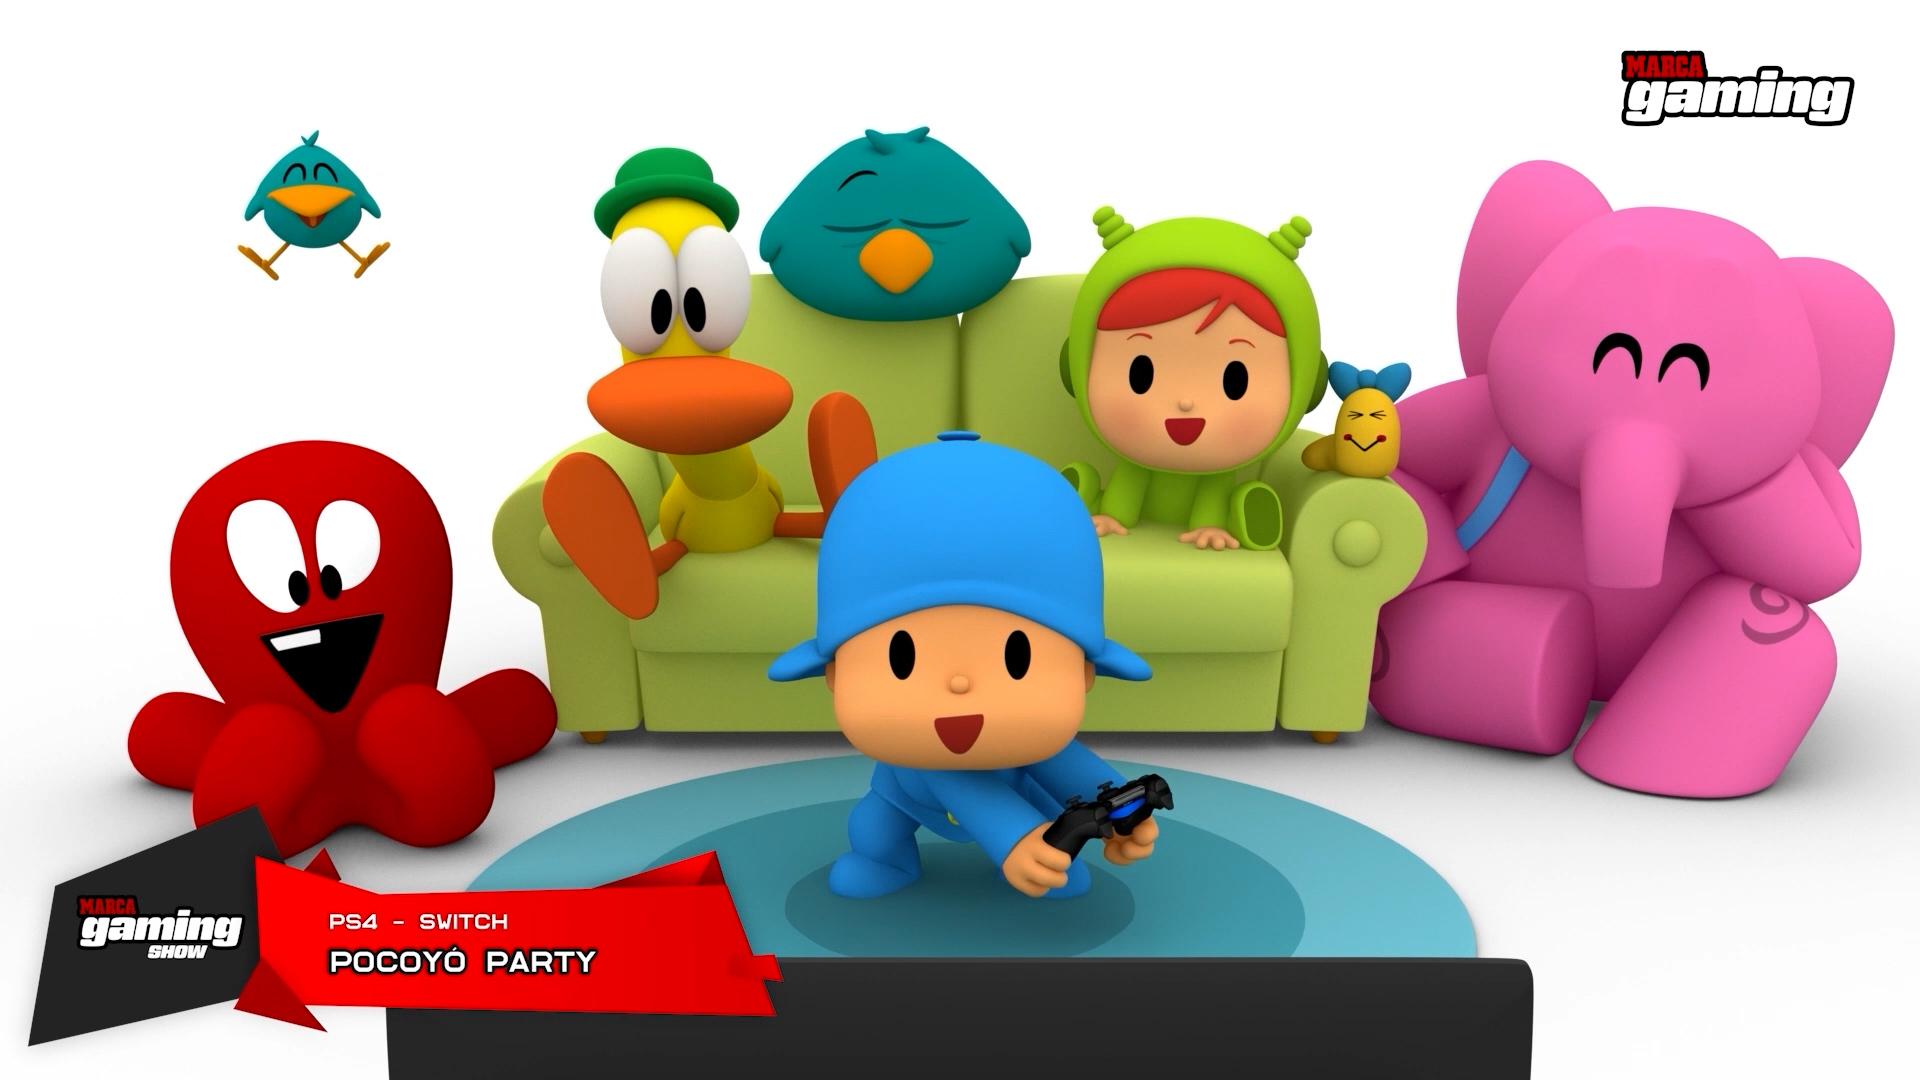 Pocoyó Party (PS4, Switch)